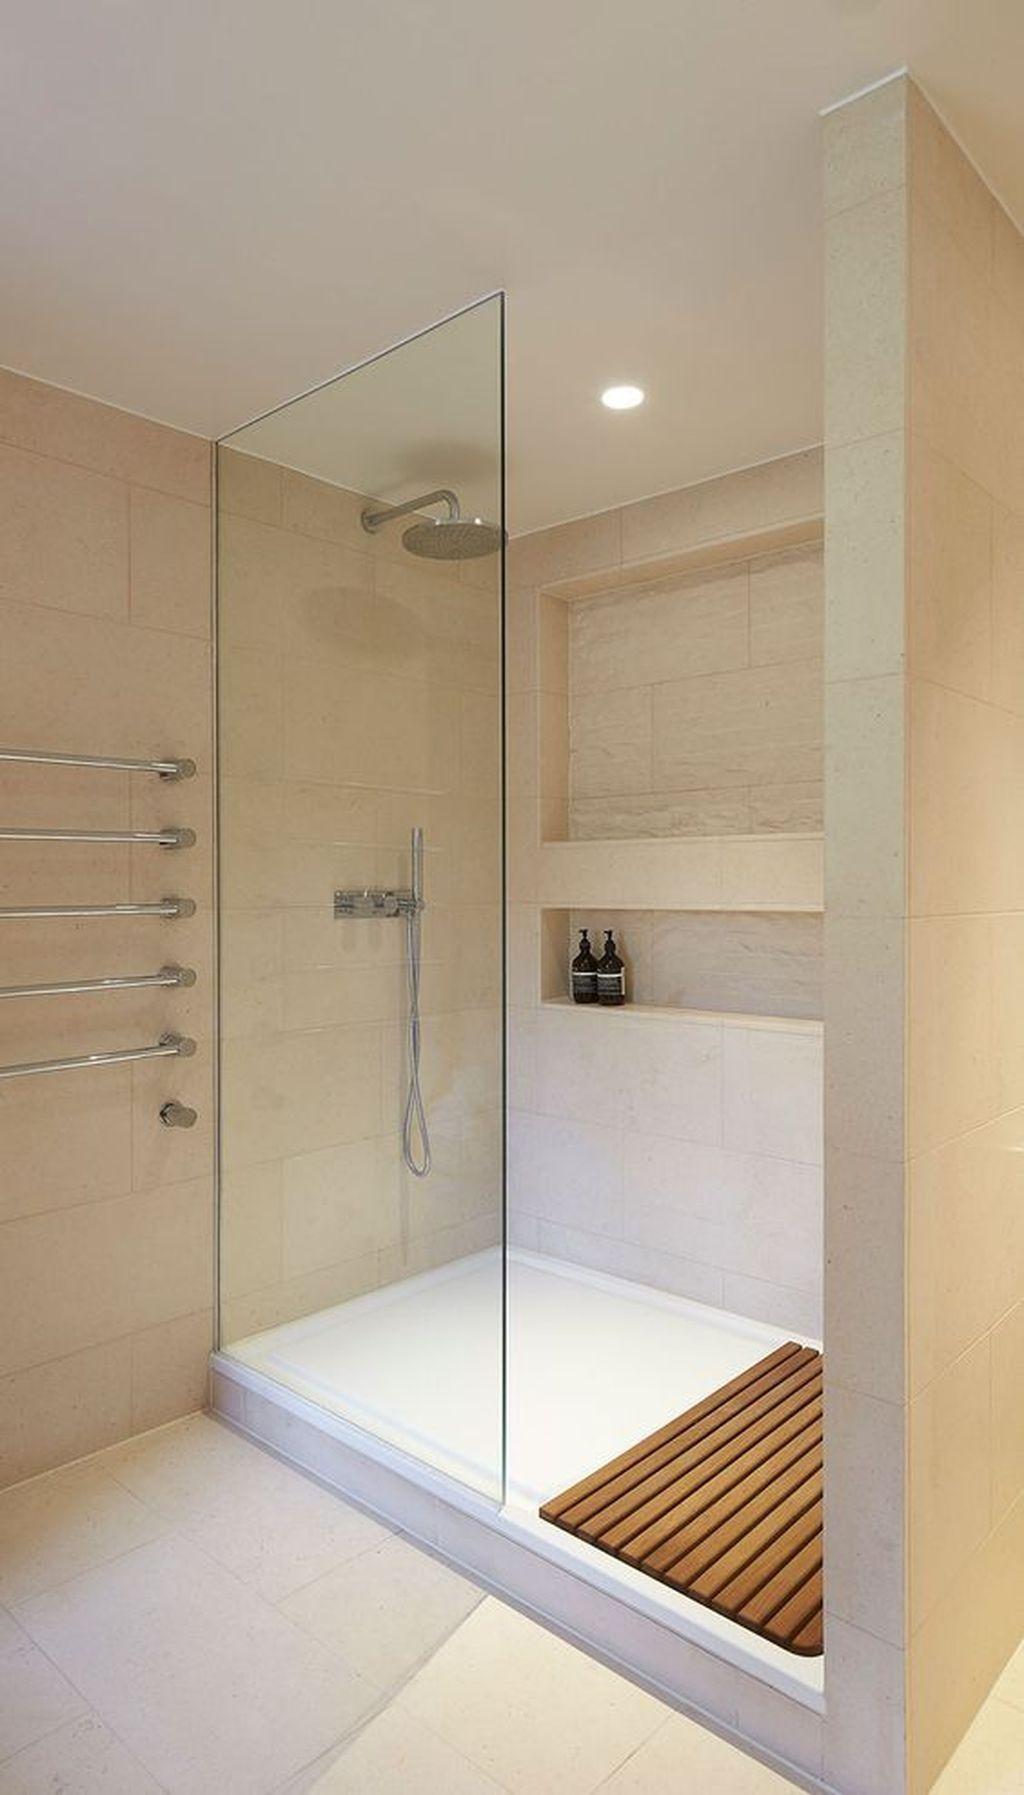 30 Affordable Stone Tiles Designs For Bathroom Shower Bathroom